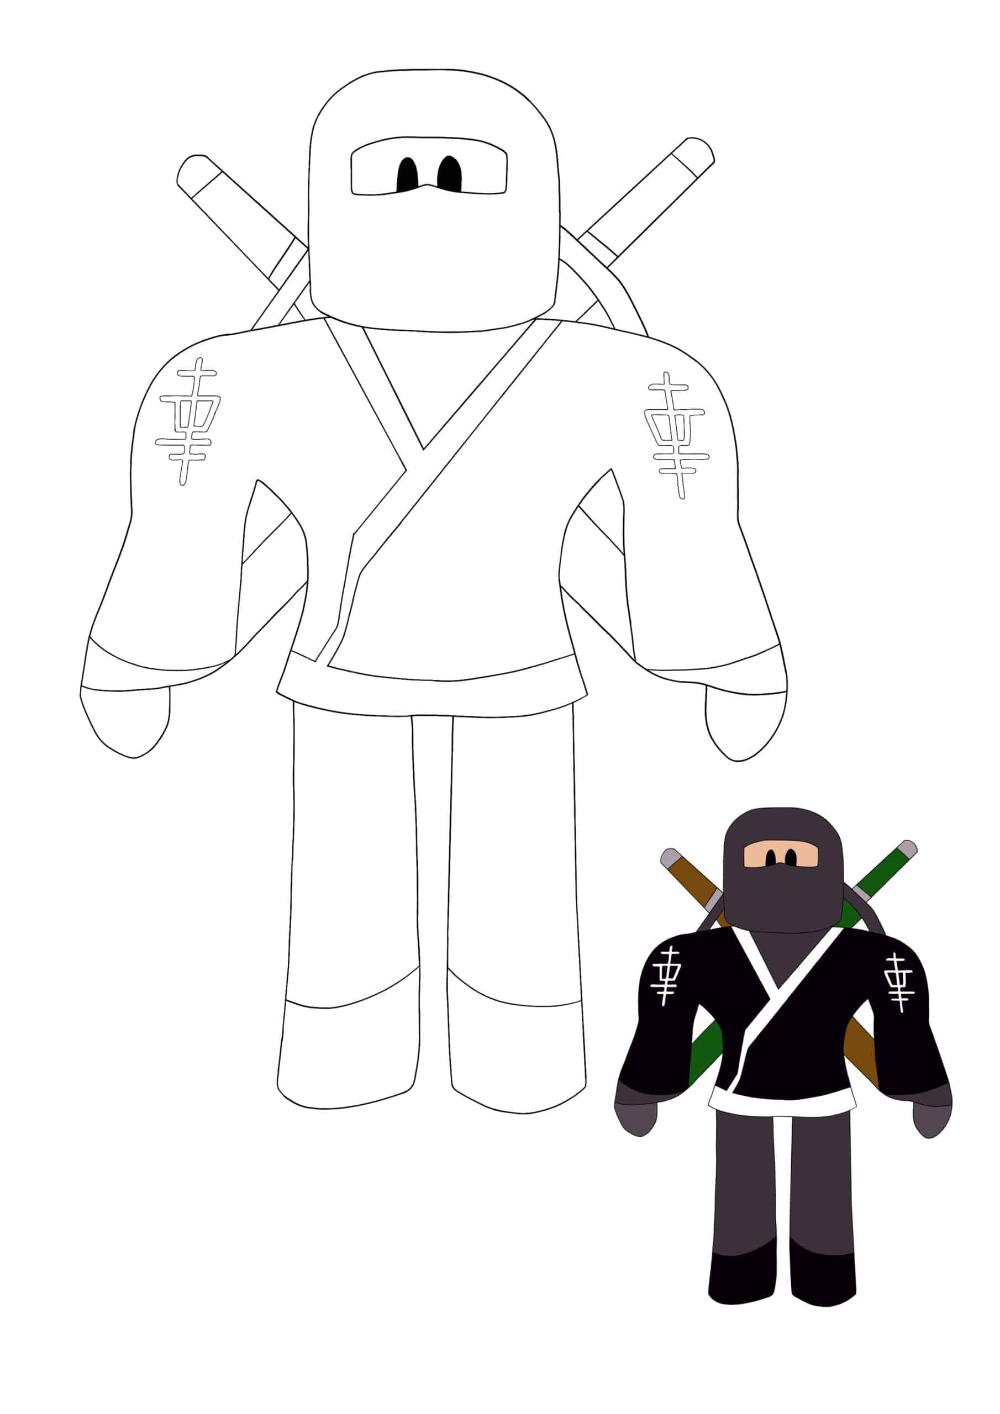 Roblox Ninja Coloring Pages 2 Free Coloring Sheets 2021 In 2021 Coloring Pages Free Coloring Sheets Free Coloring